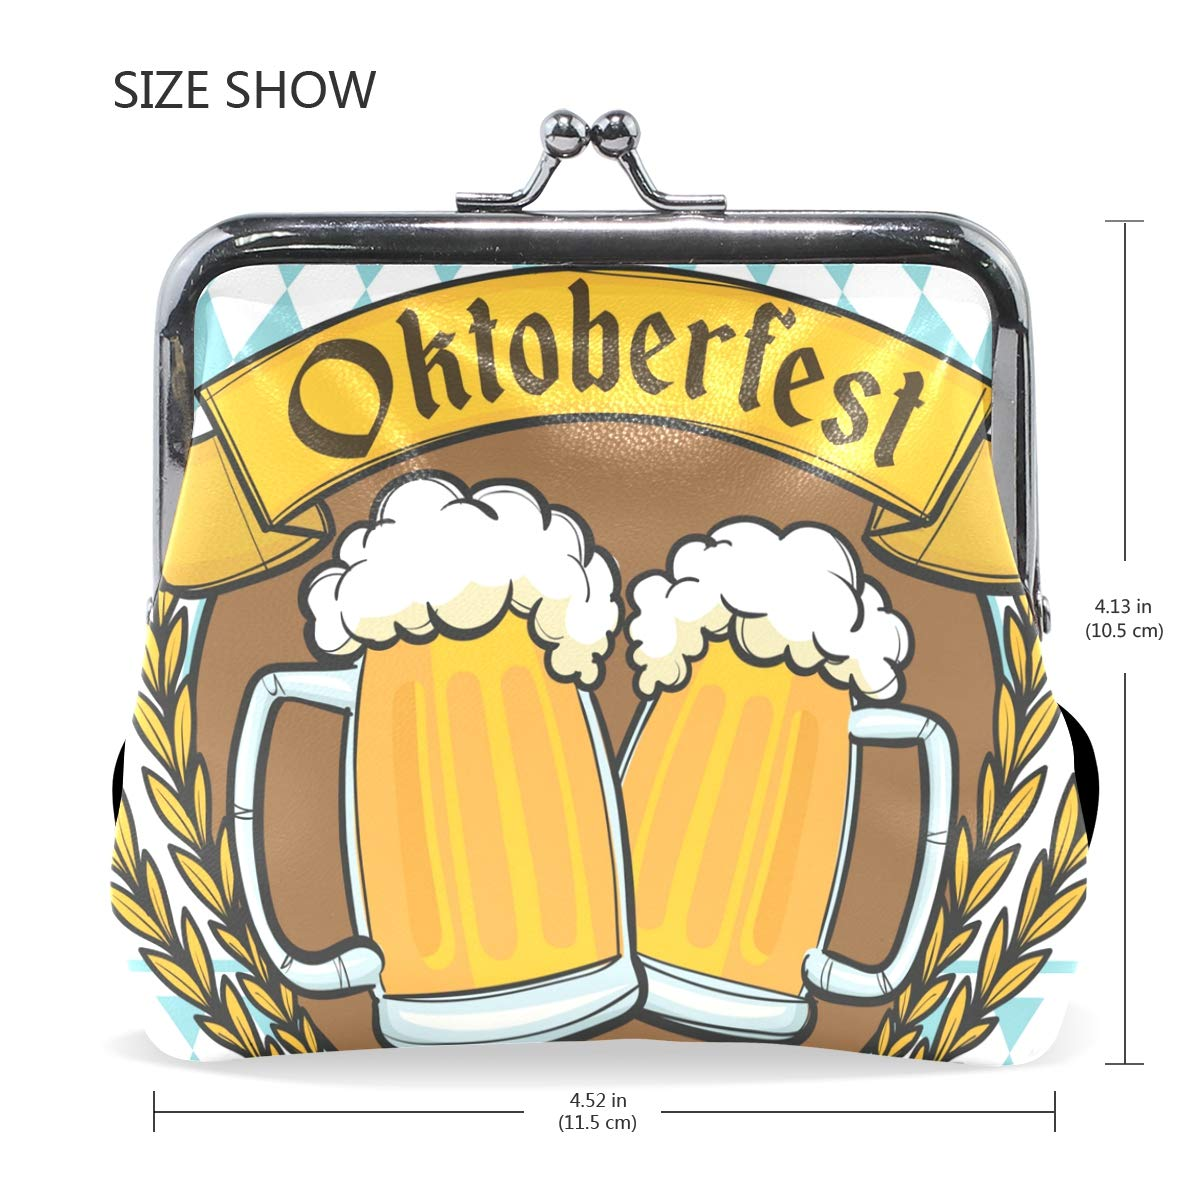 LALATOP Oktoberfest Insignia Beers Womens Coin Pouch Purse wallet Card Holder Clutch Handbag